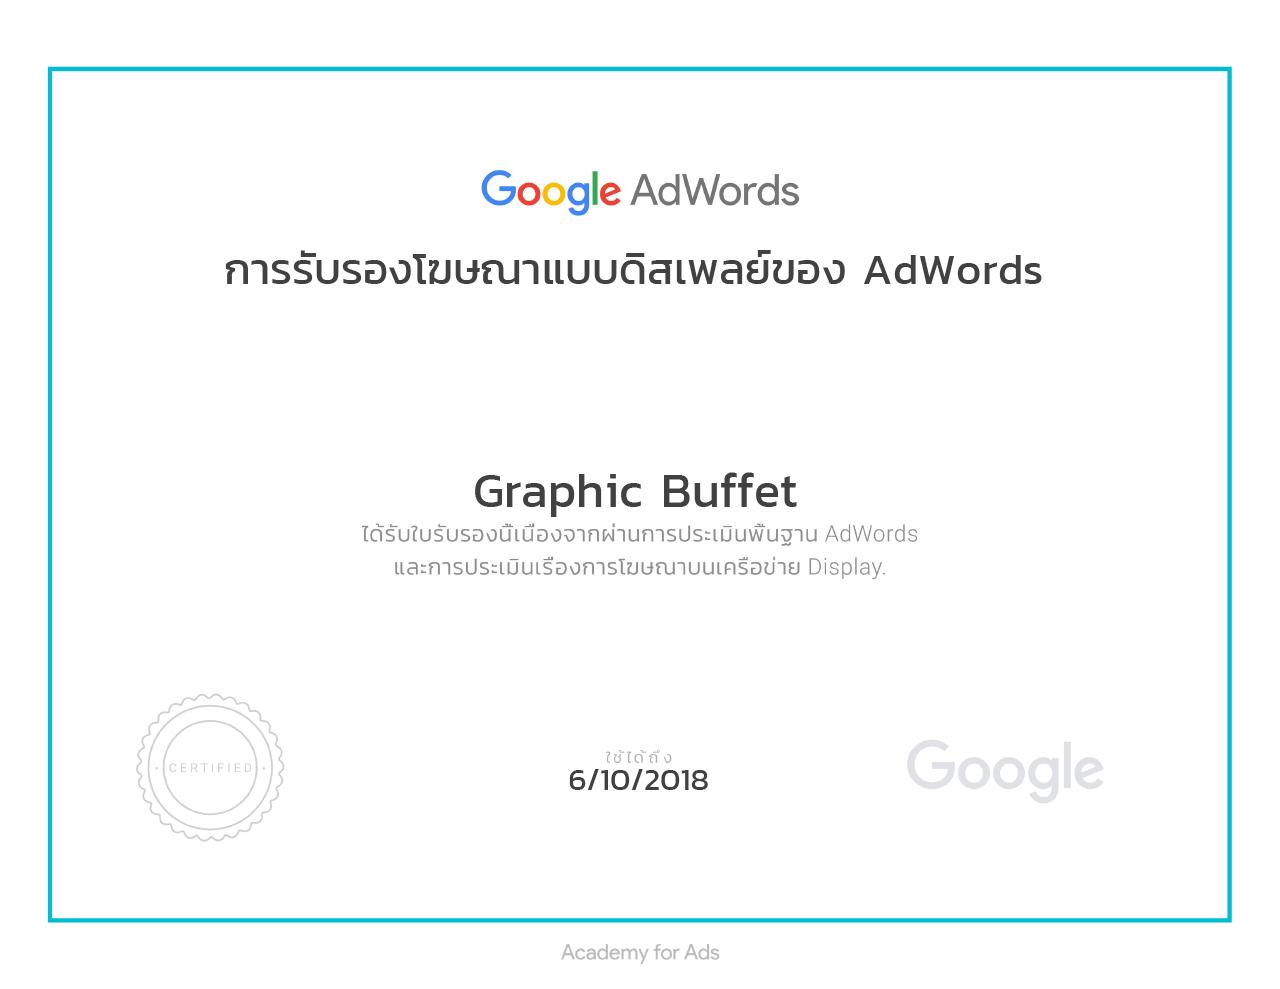 certificate 03620 7215089 รับทำ Google Adwords